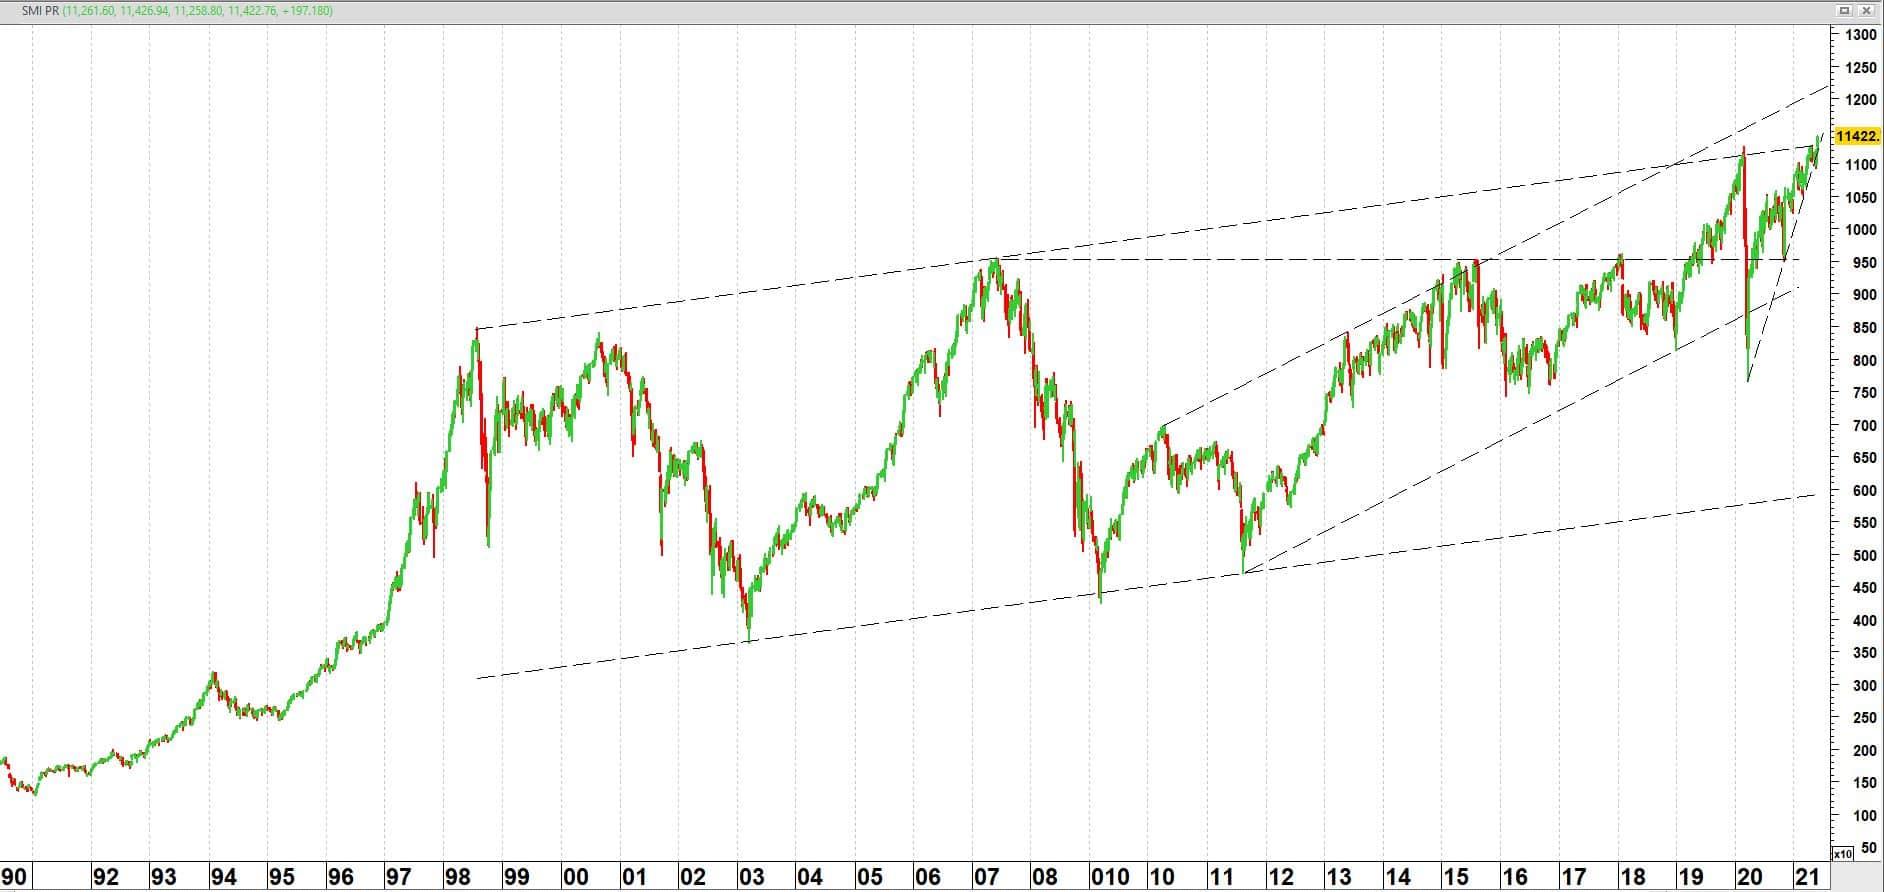 Swiss Market Index op weekbasis vanaf medio 1990